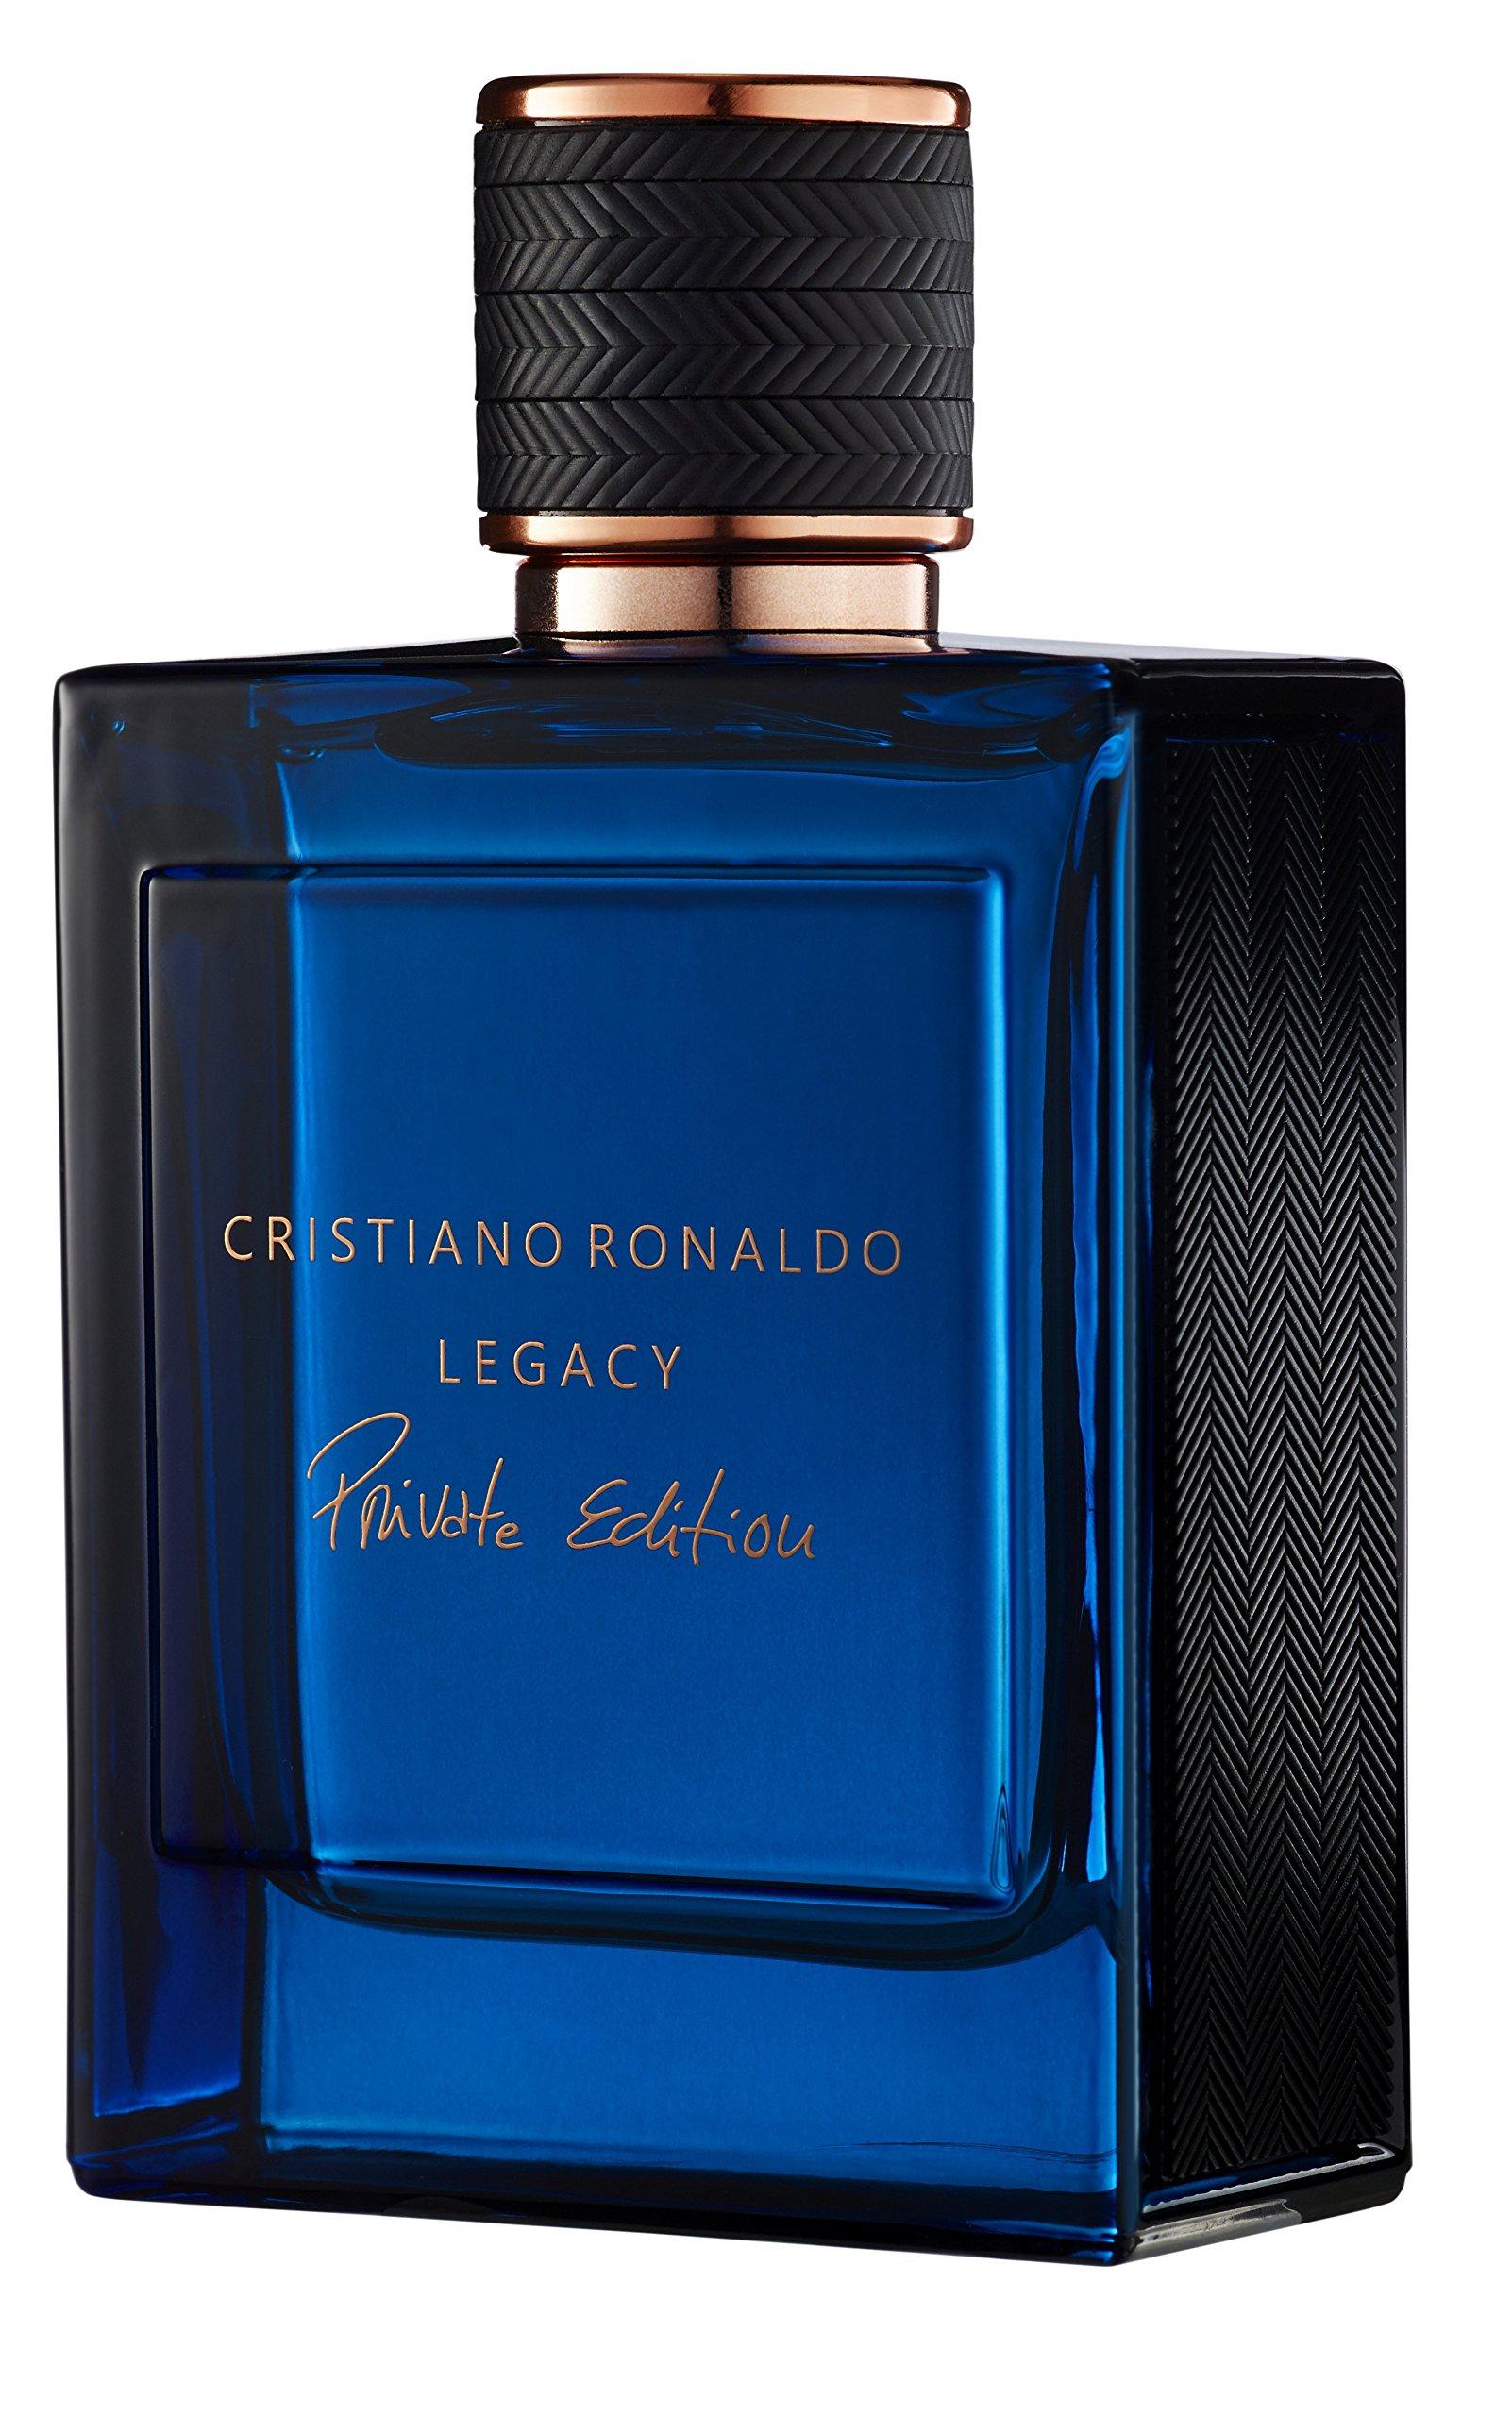 Cristiano Ronaldo Legacy Cristiano Ronaldo Men 3.4 Oz Edp Spray (private Edition), 3.4 Oz